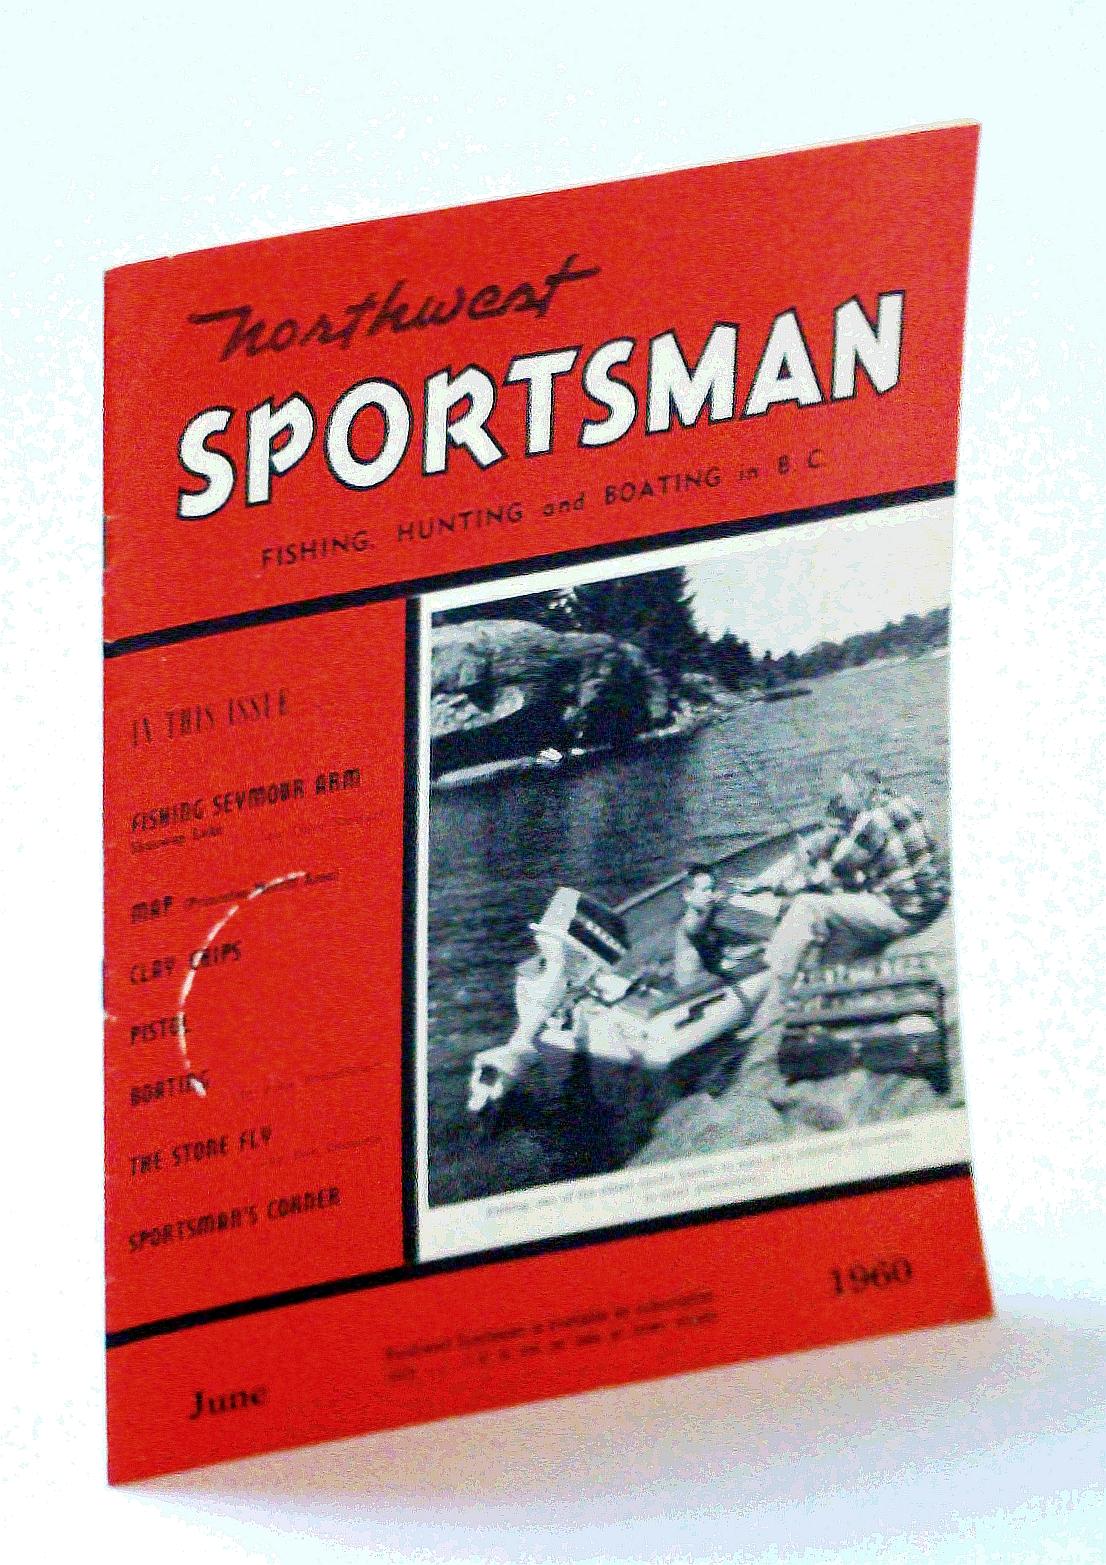 Image for Northwest Sportsman Magazine - Fishing, Hunting and Boating in B.C., June 1960 - Fishing Seymour Arm, Shuswap Lake